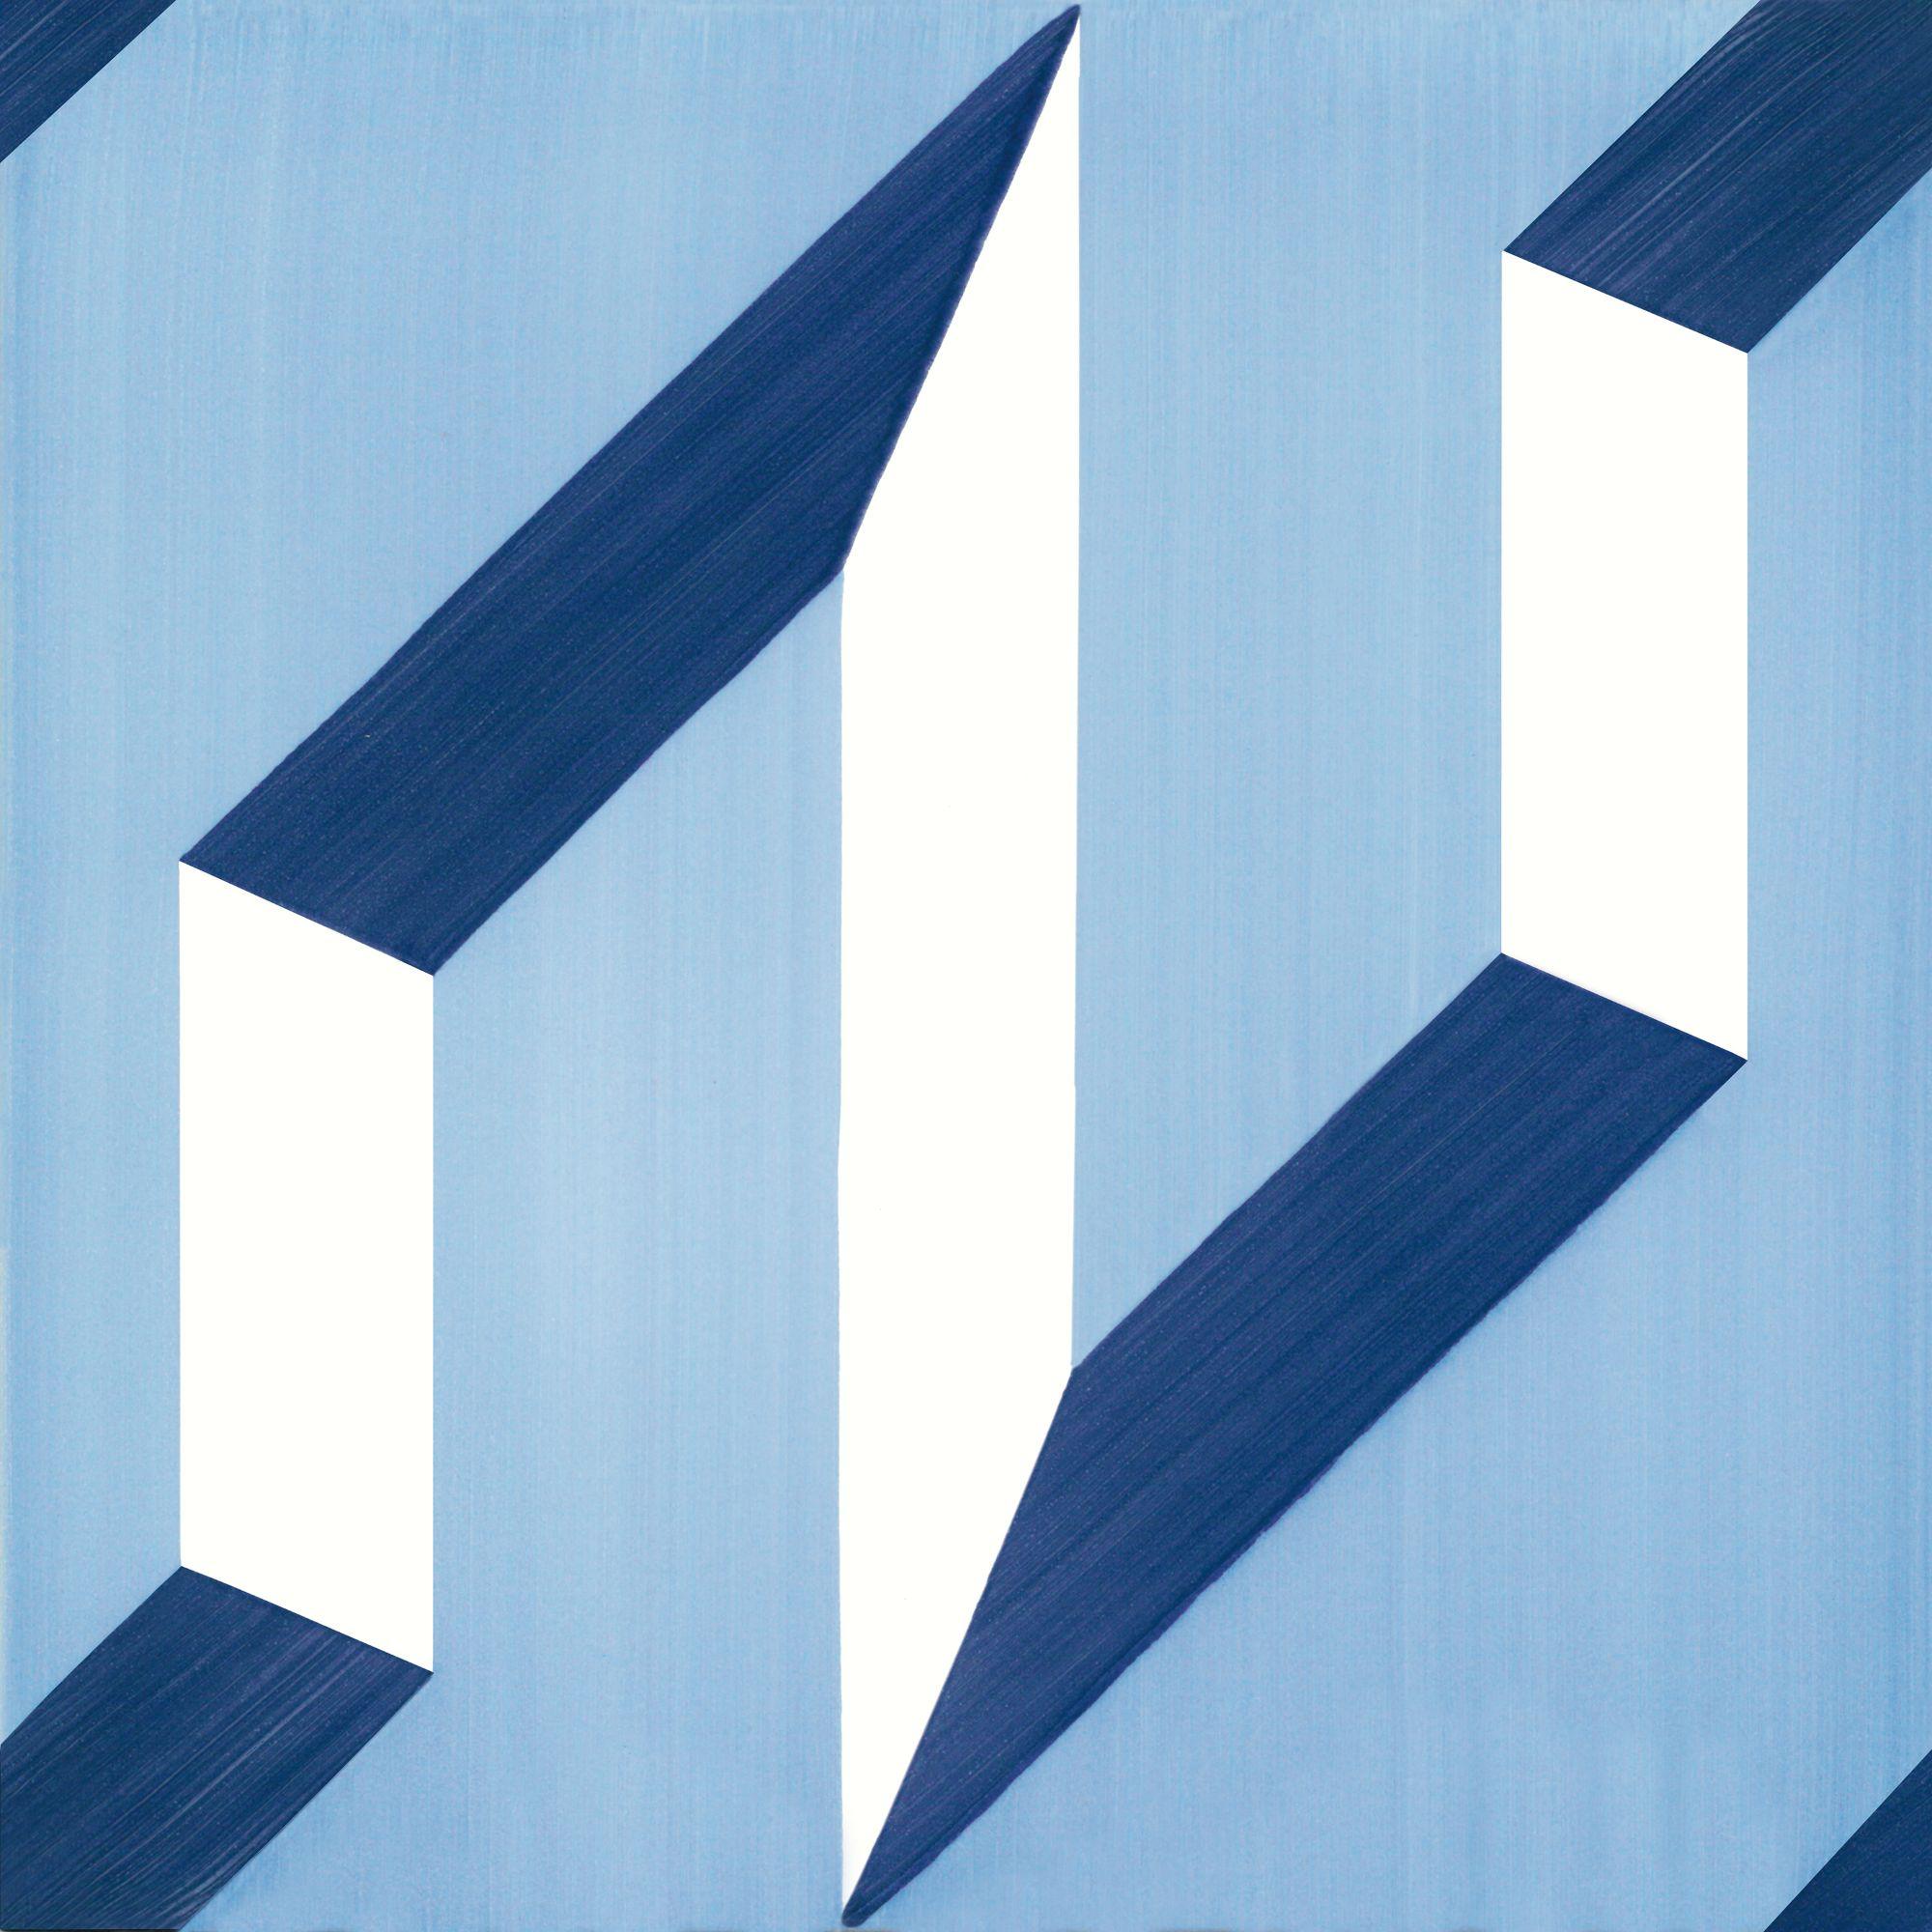 blu-ponti-decoro-tipo-1